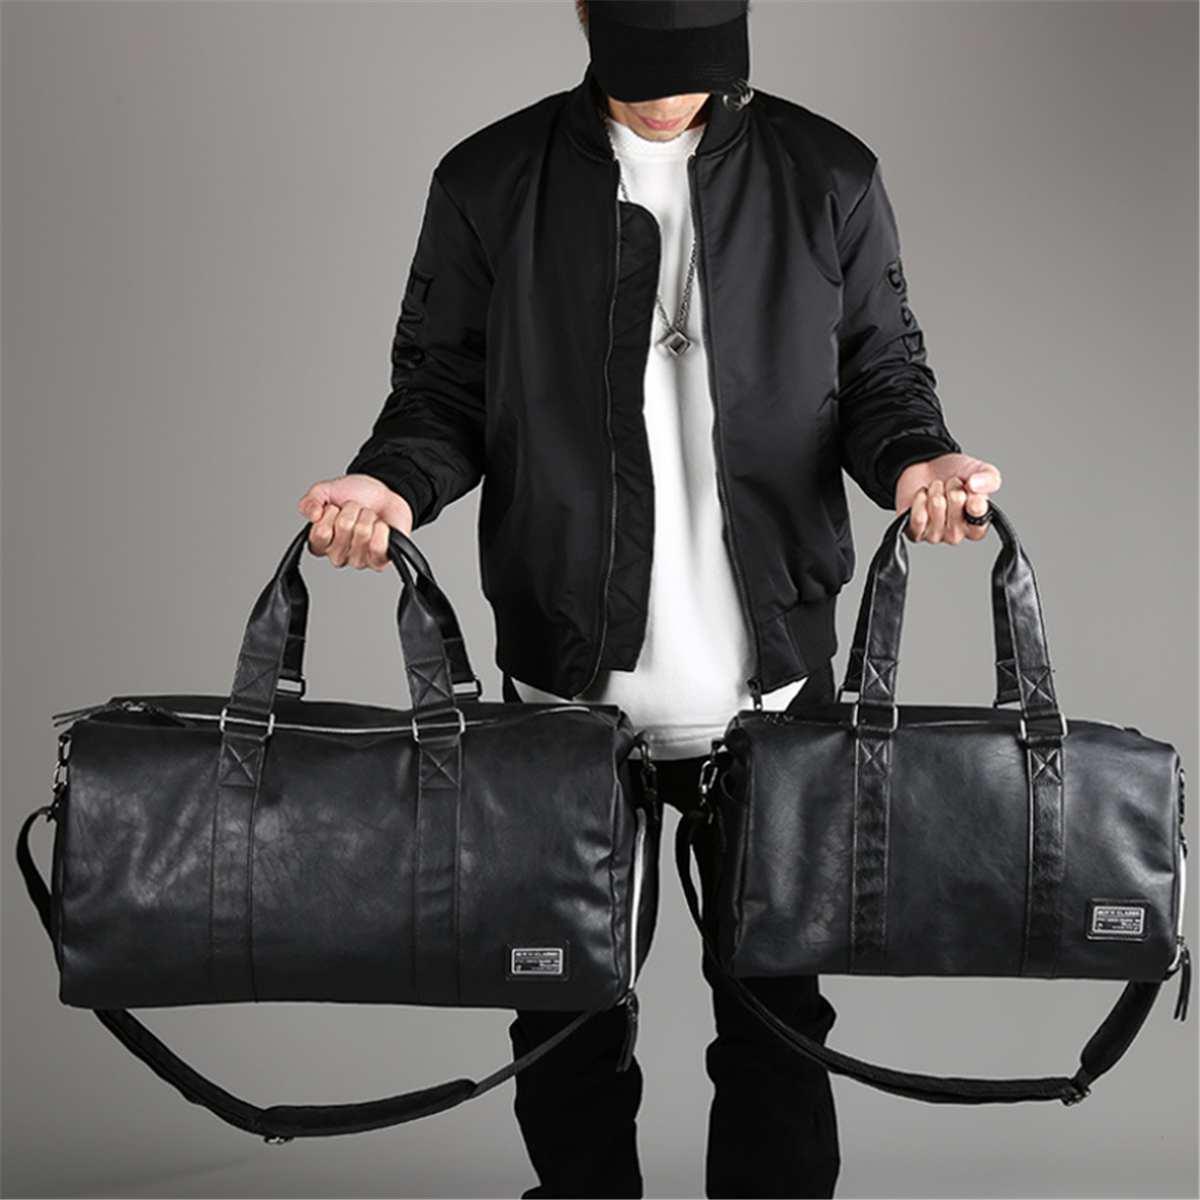 2021 New Men Travel Duffle Bags Black Waterproof PU Leather Handbags Shoulder Bag For Women Man Totes Large Capacity Weekend Bag